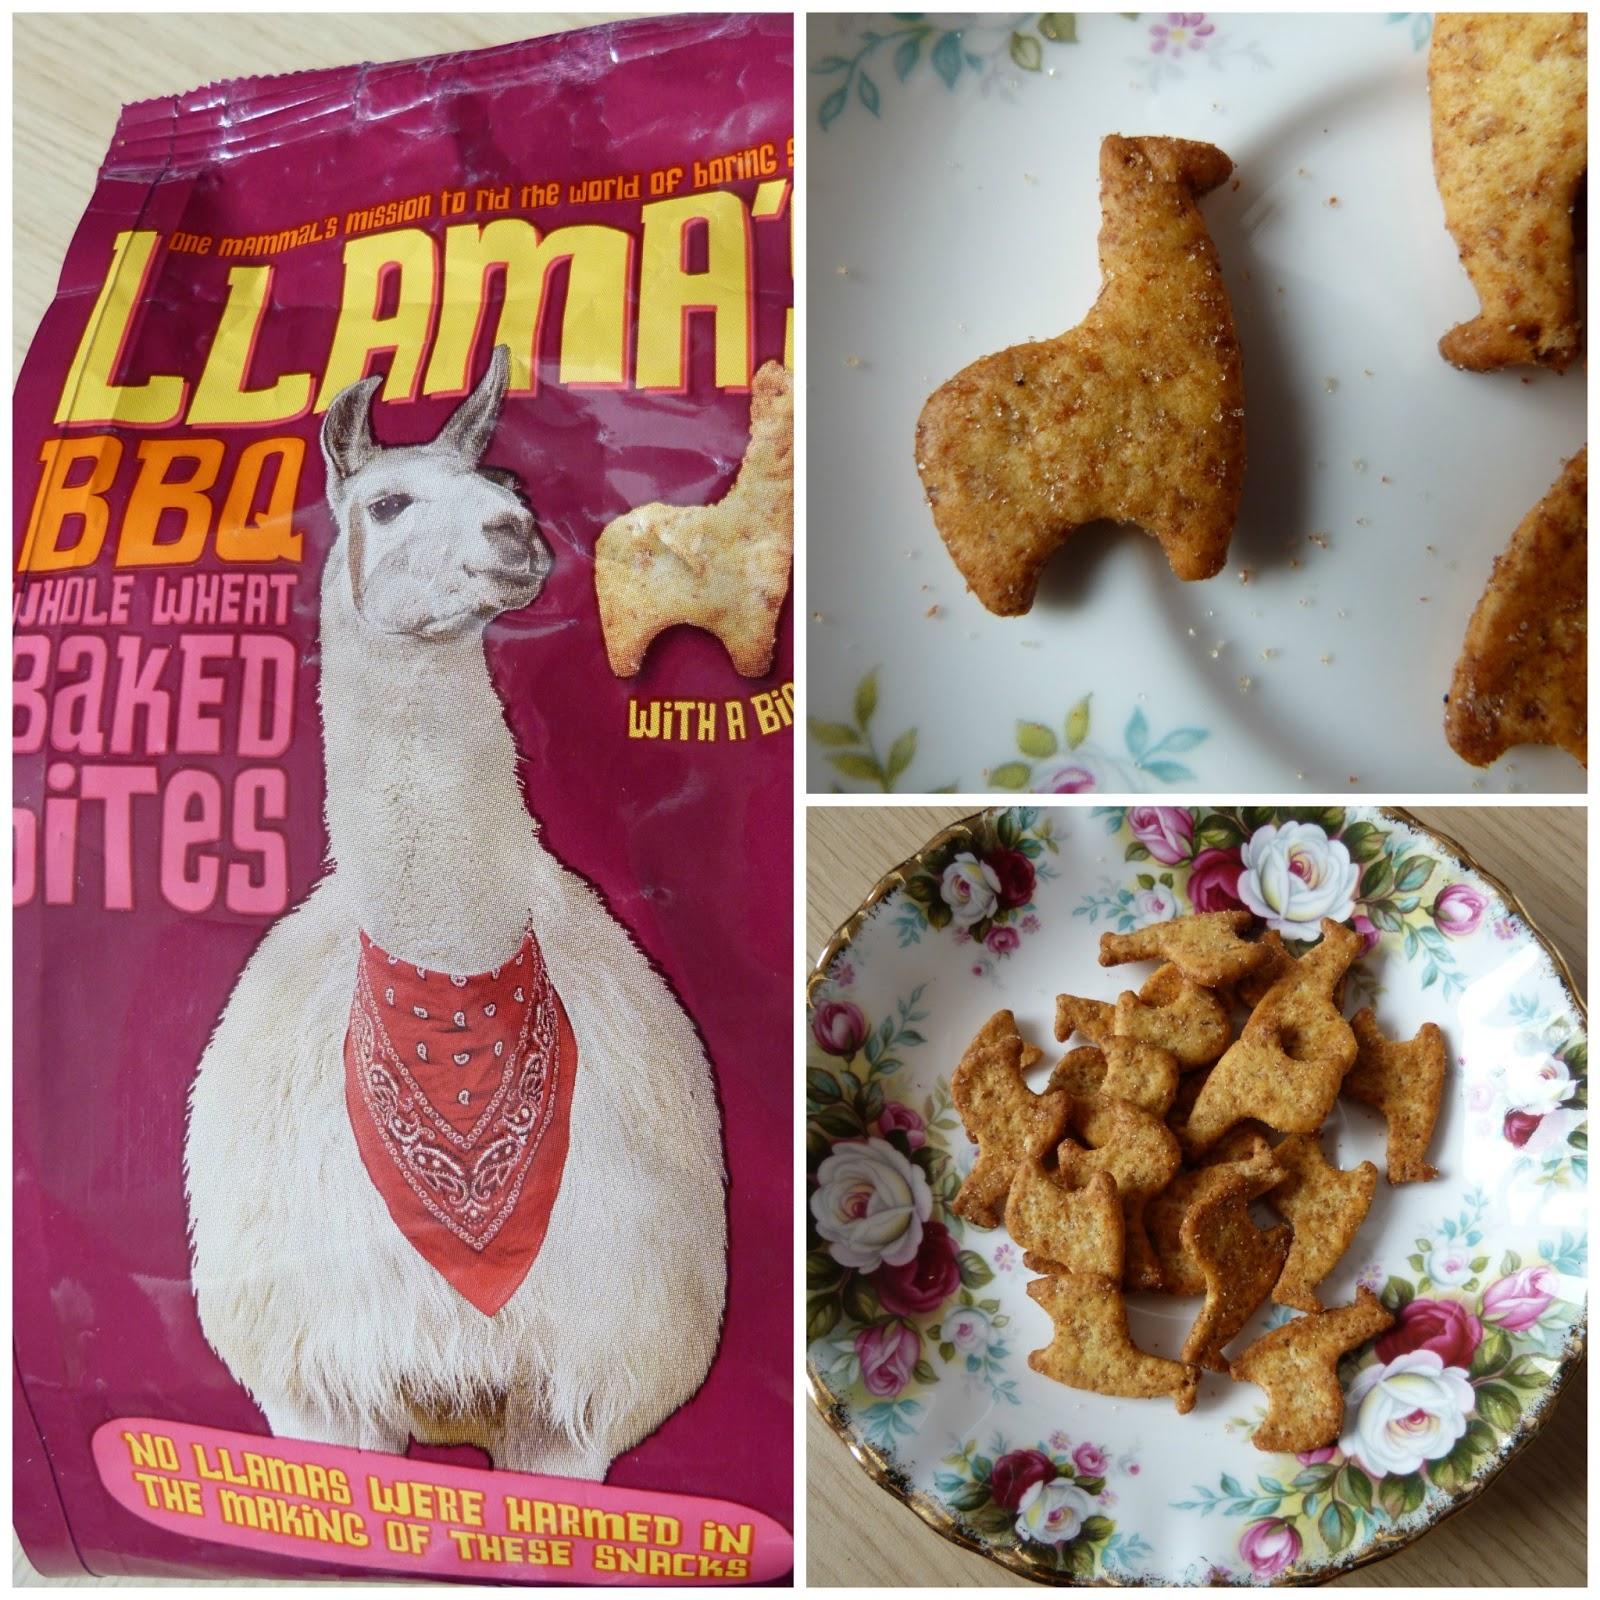 Where Can I Buy Llama Food